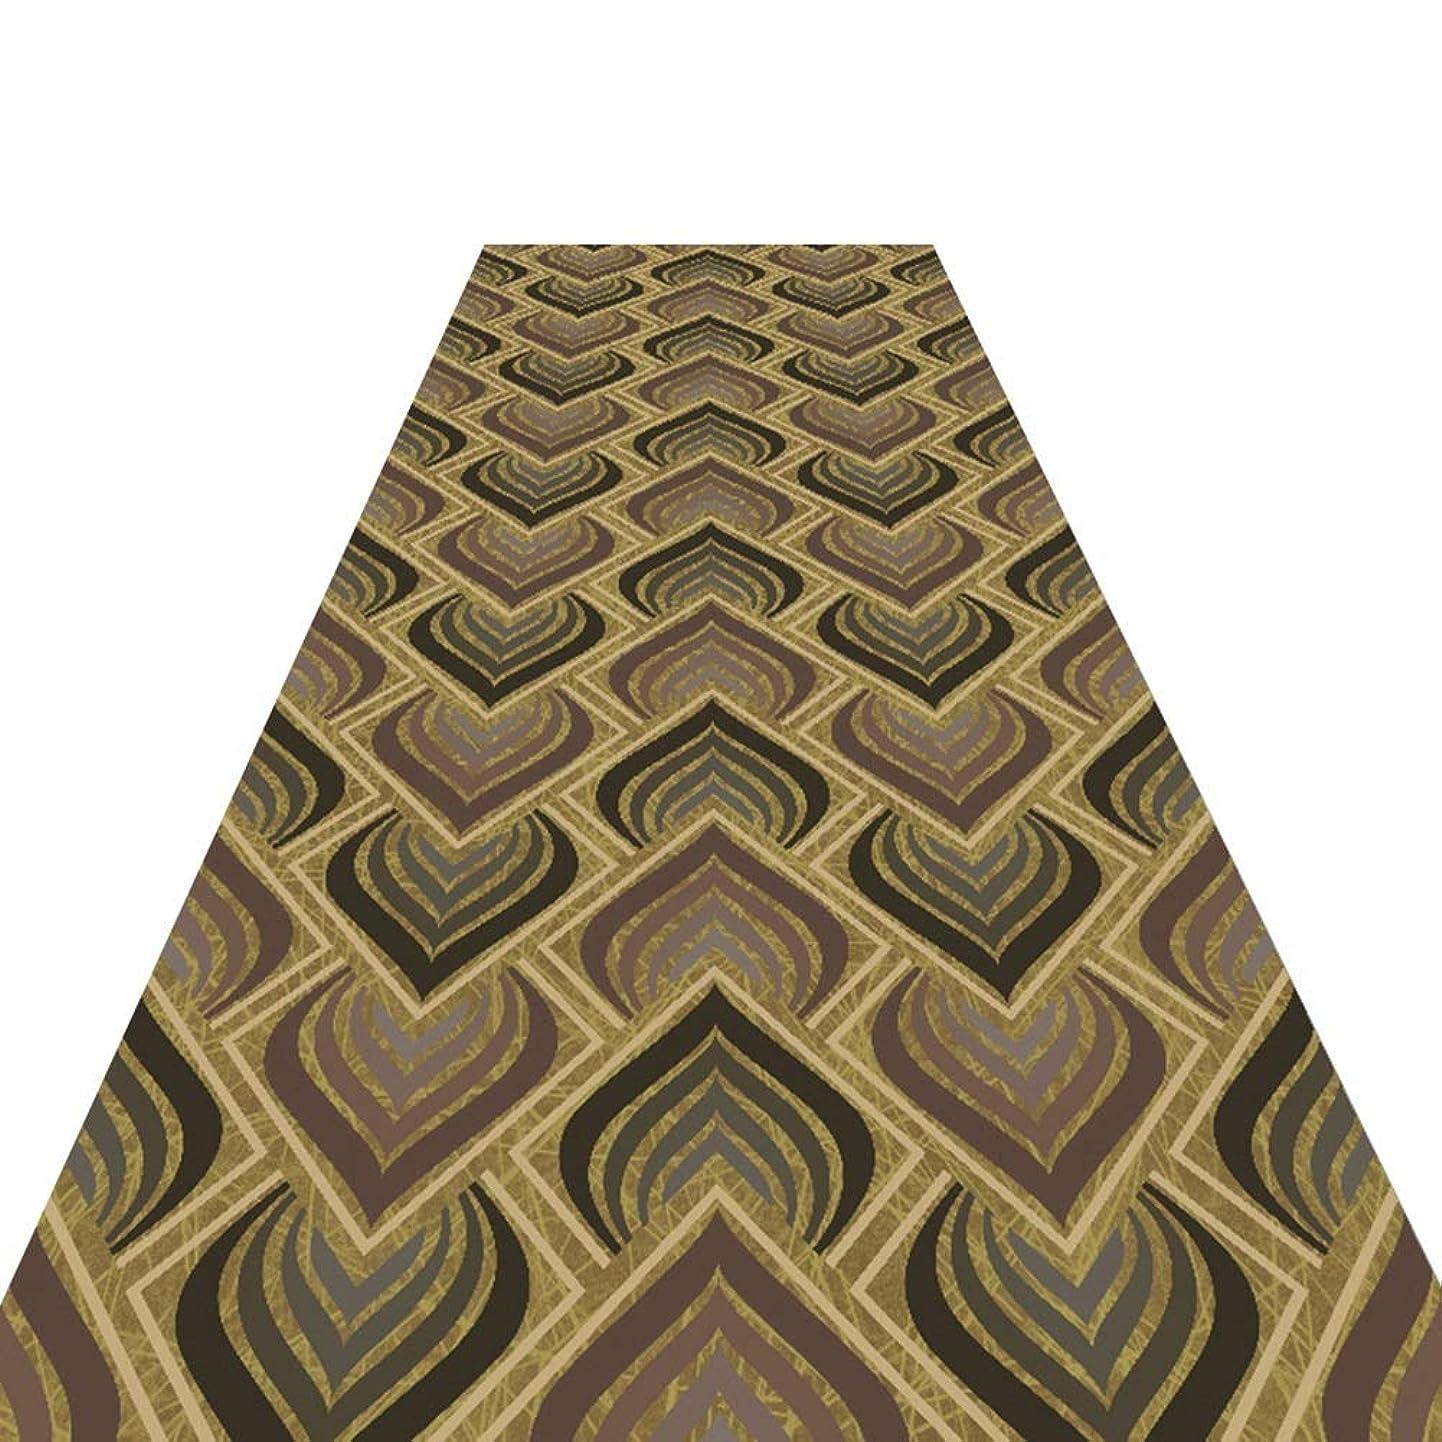 HAIPENG Long Hallway Runner Rug Corridor Aisle Entryway Rug Non Slip Area Rugs Washable Cuttable Customized Dark Khaki, 6mm (Color : A, Size : 1.4x1m) gilobobkwfr7